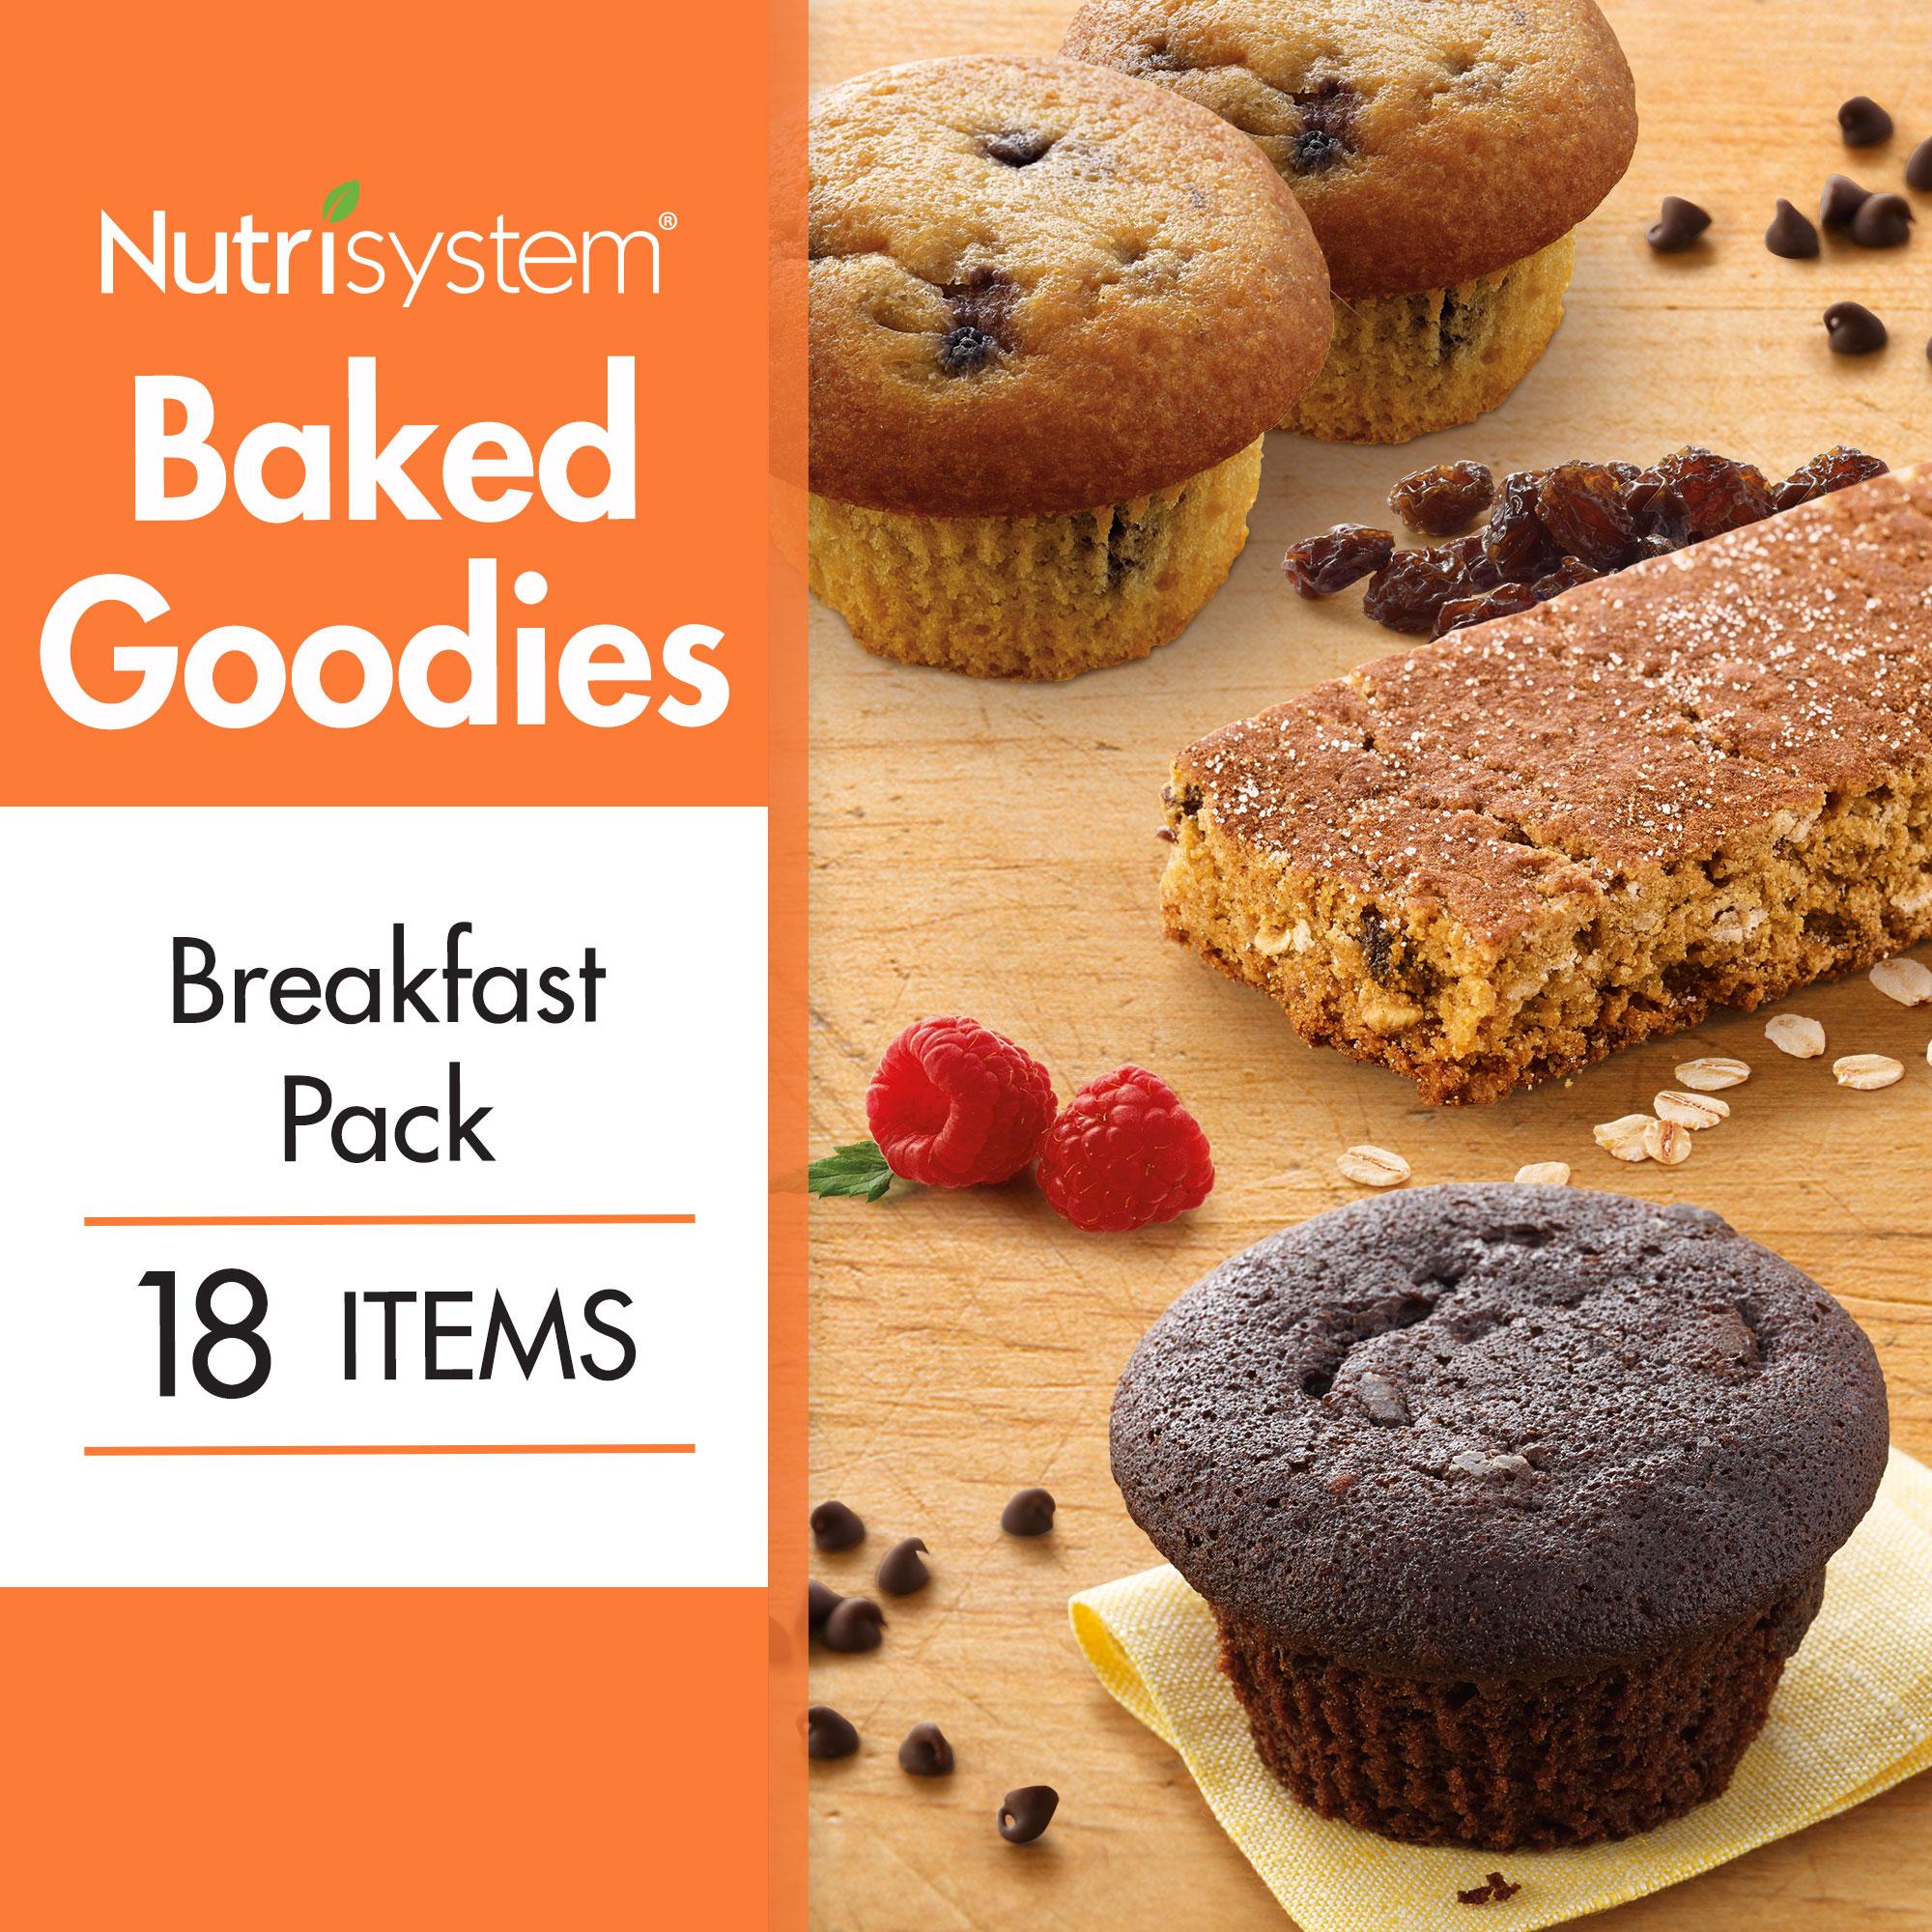 Nutrisystem Baked Goodies Breakfast Pack, 18 Ct